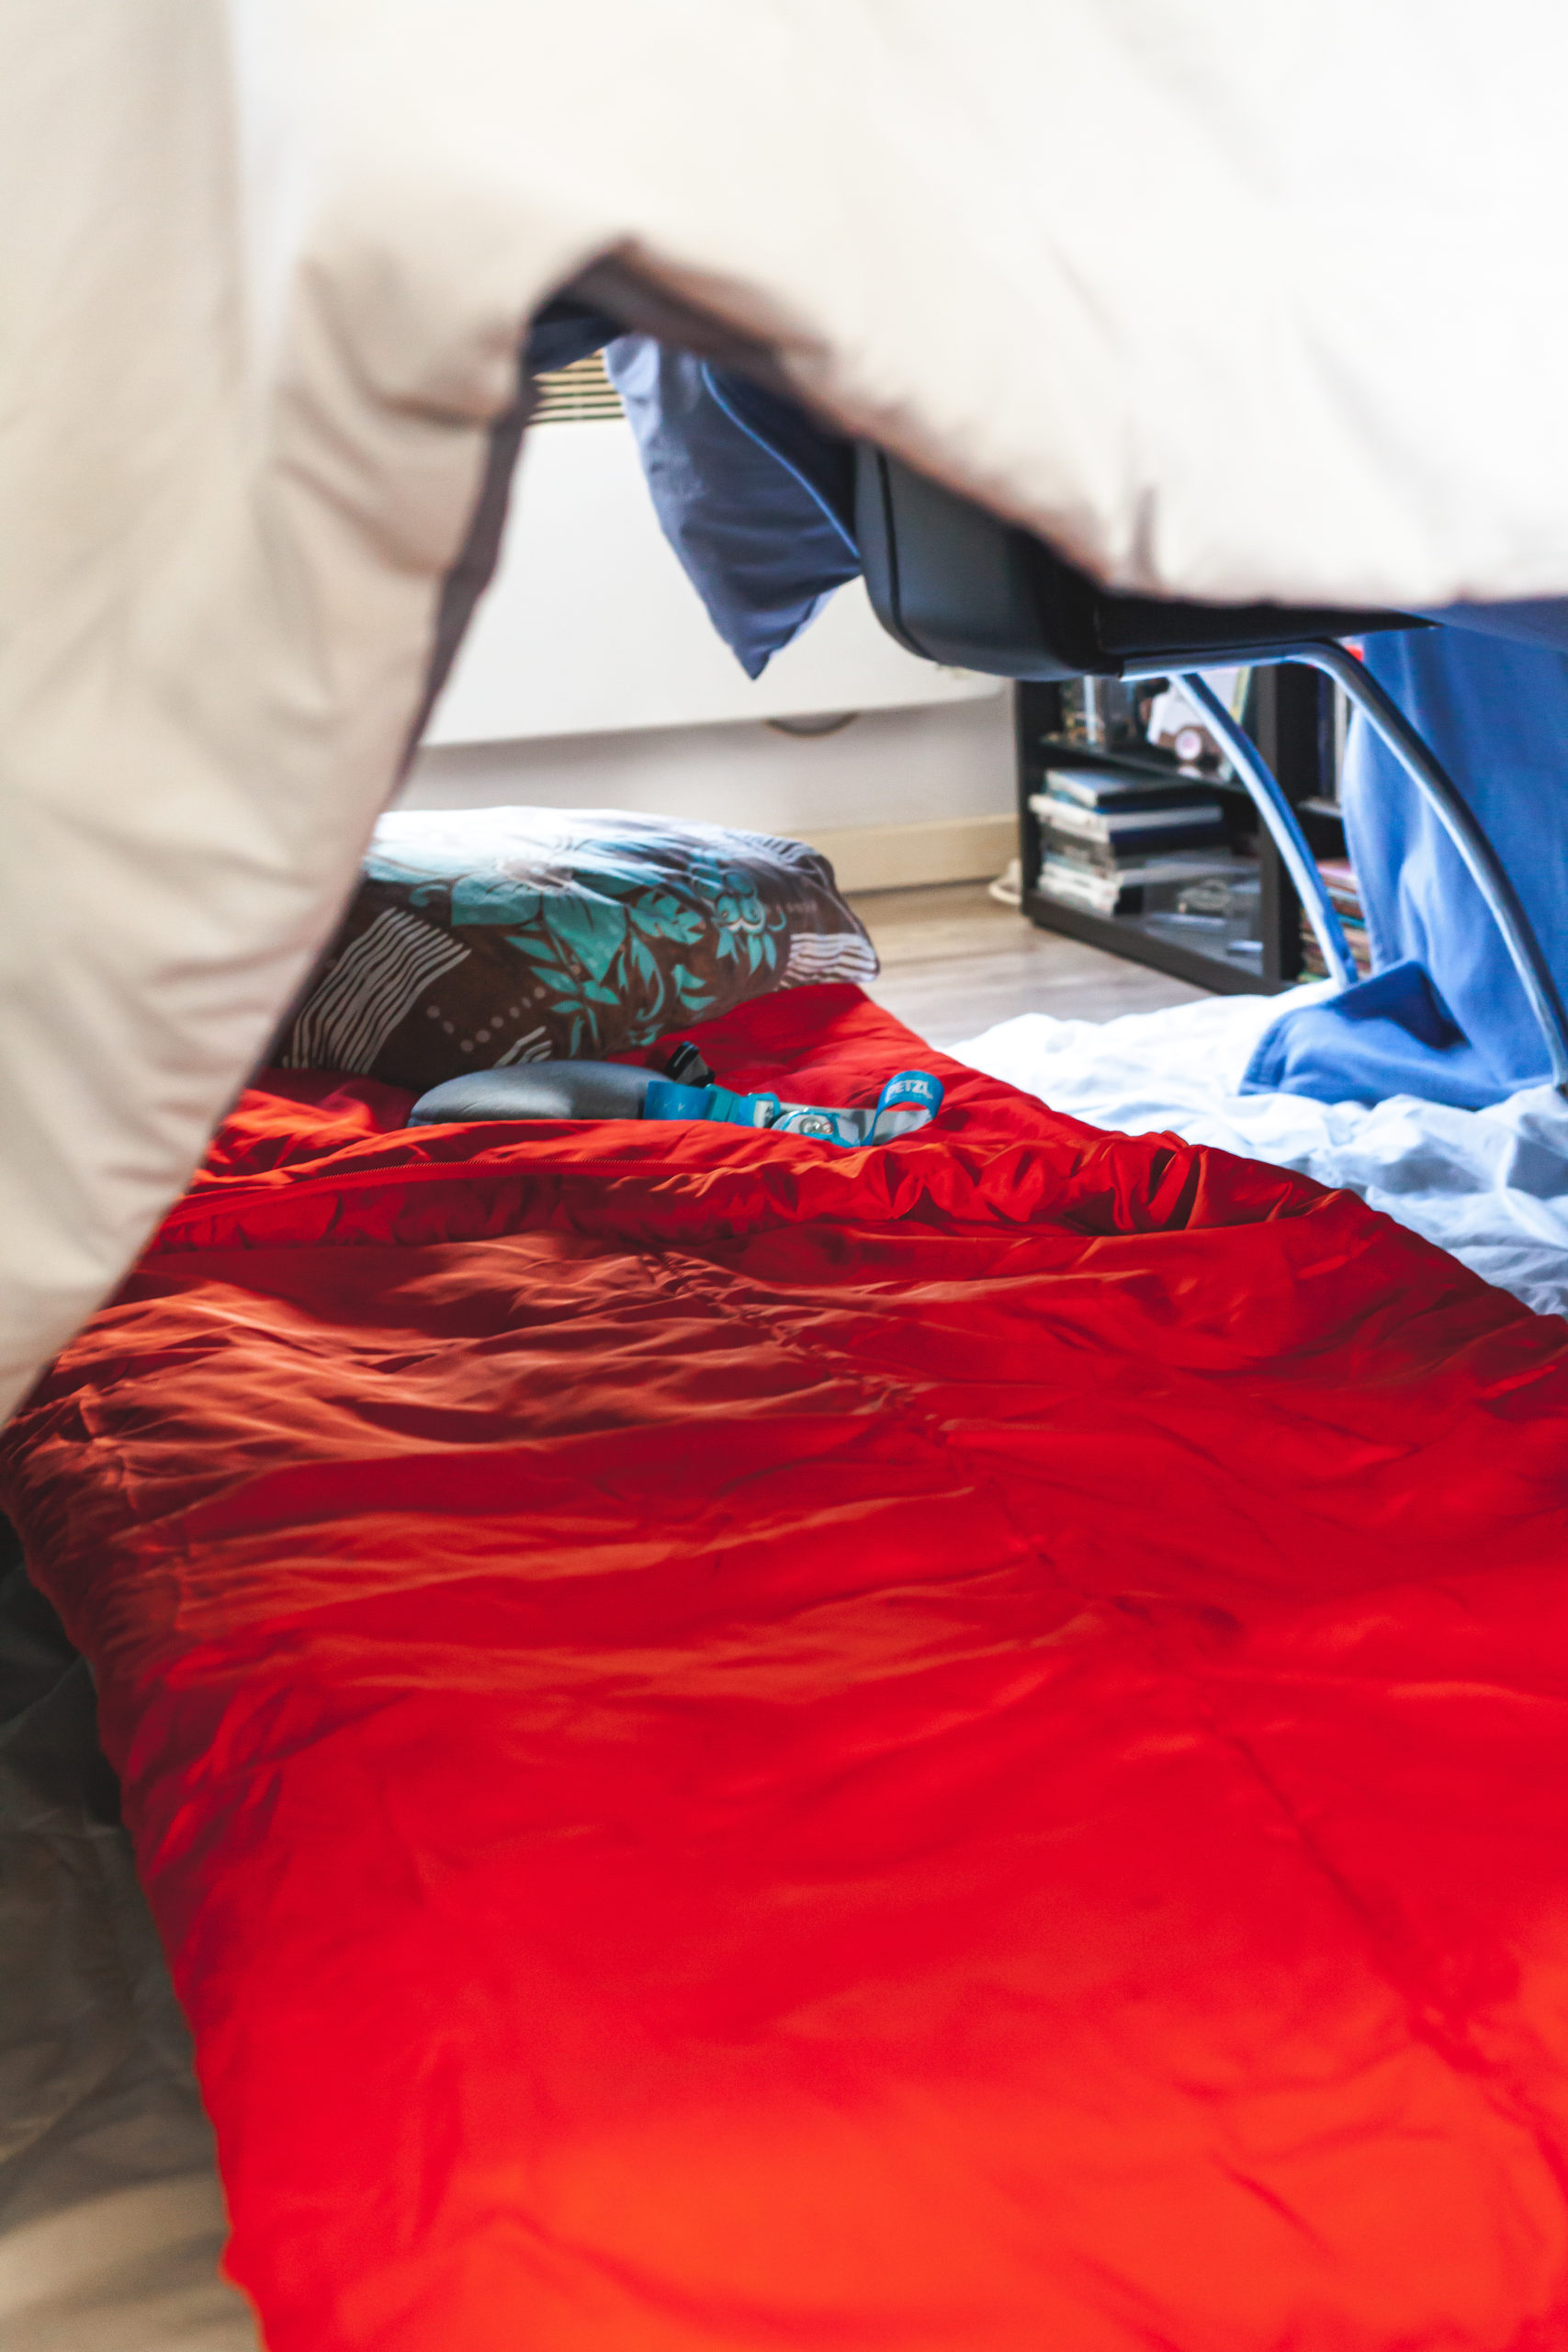 a-l-interieur-de-la-tente-camping-de-salon